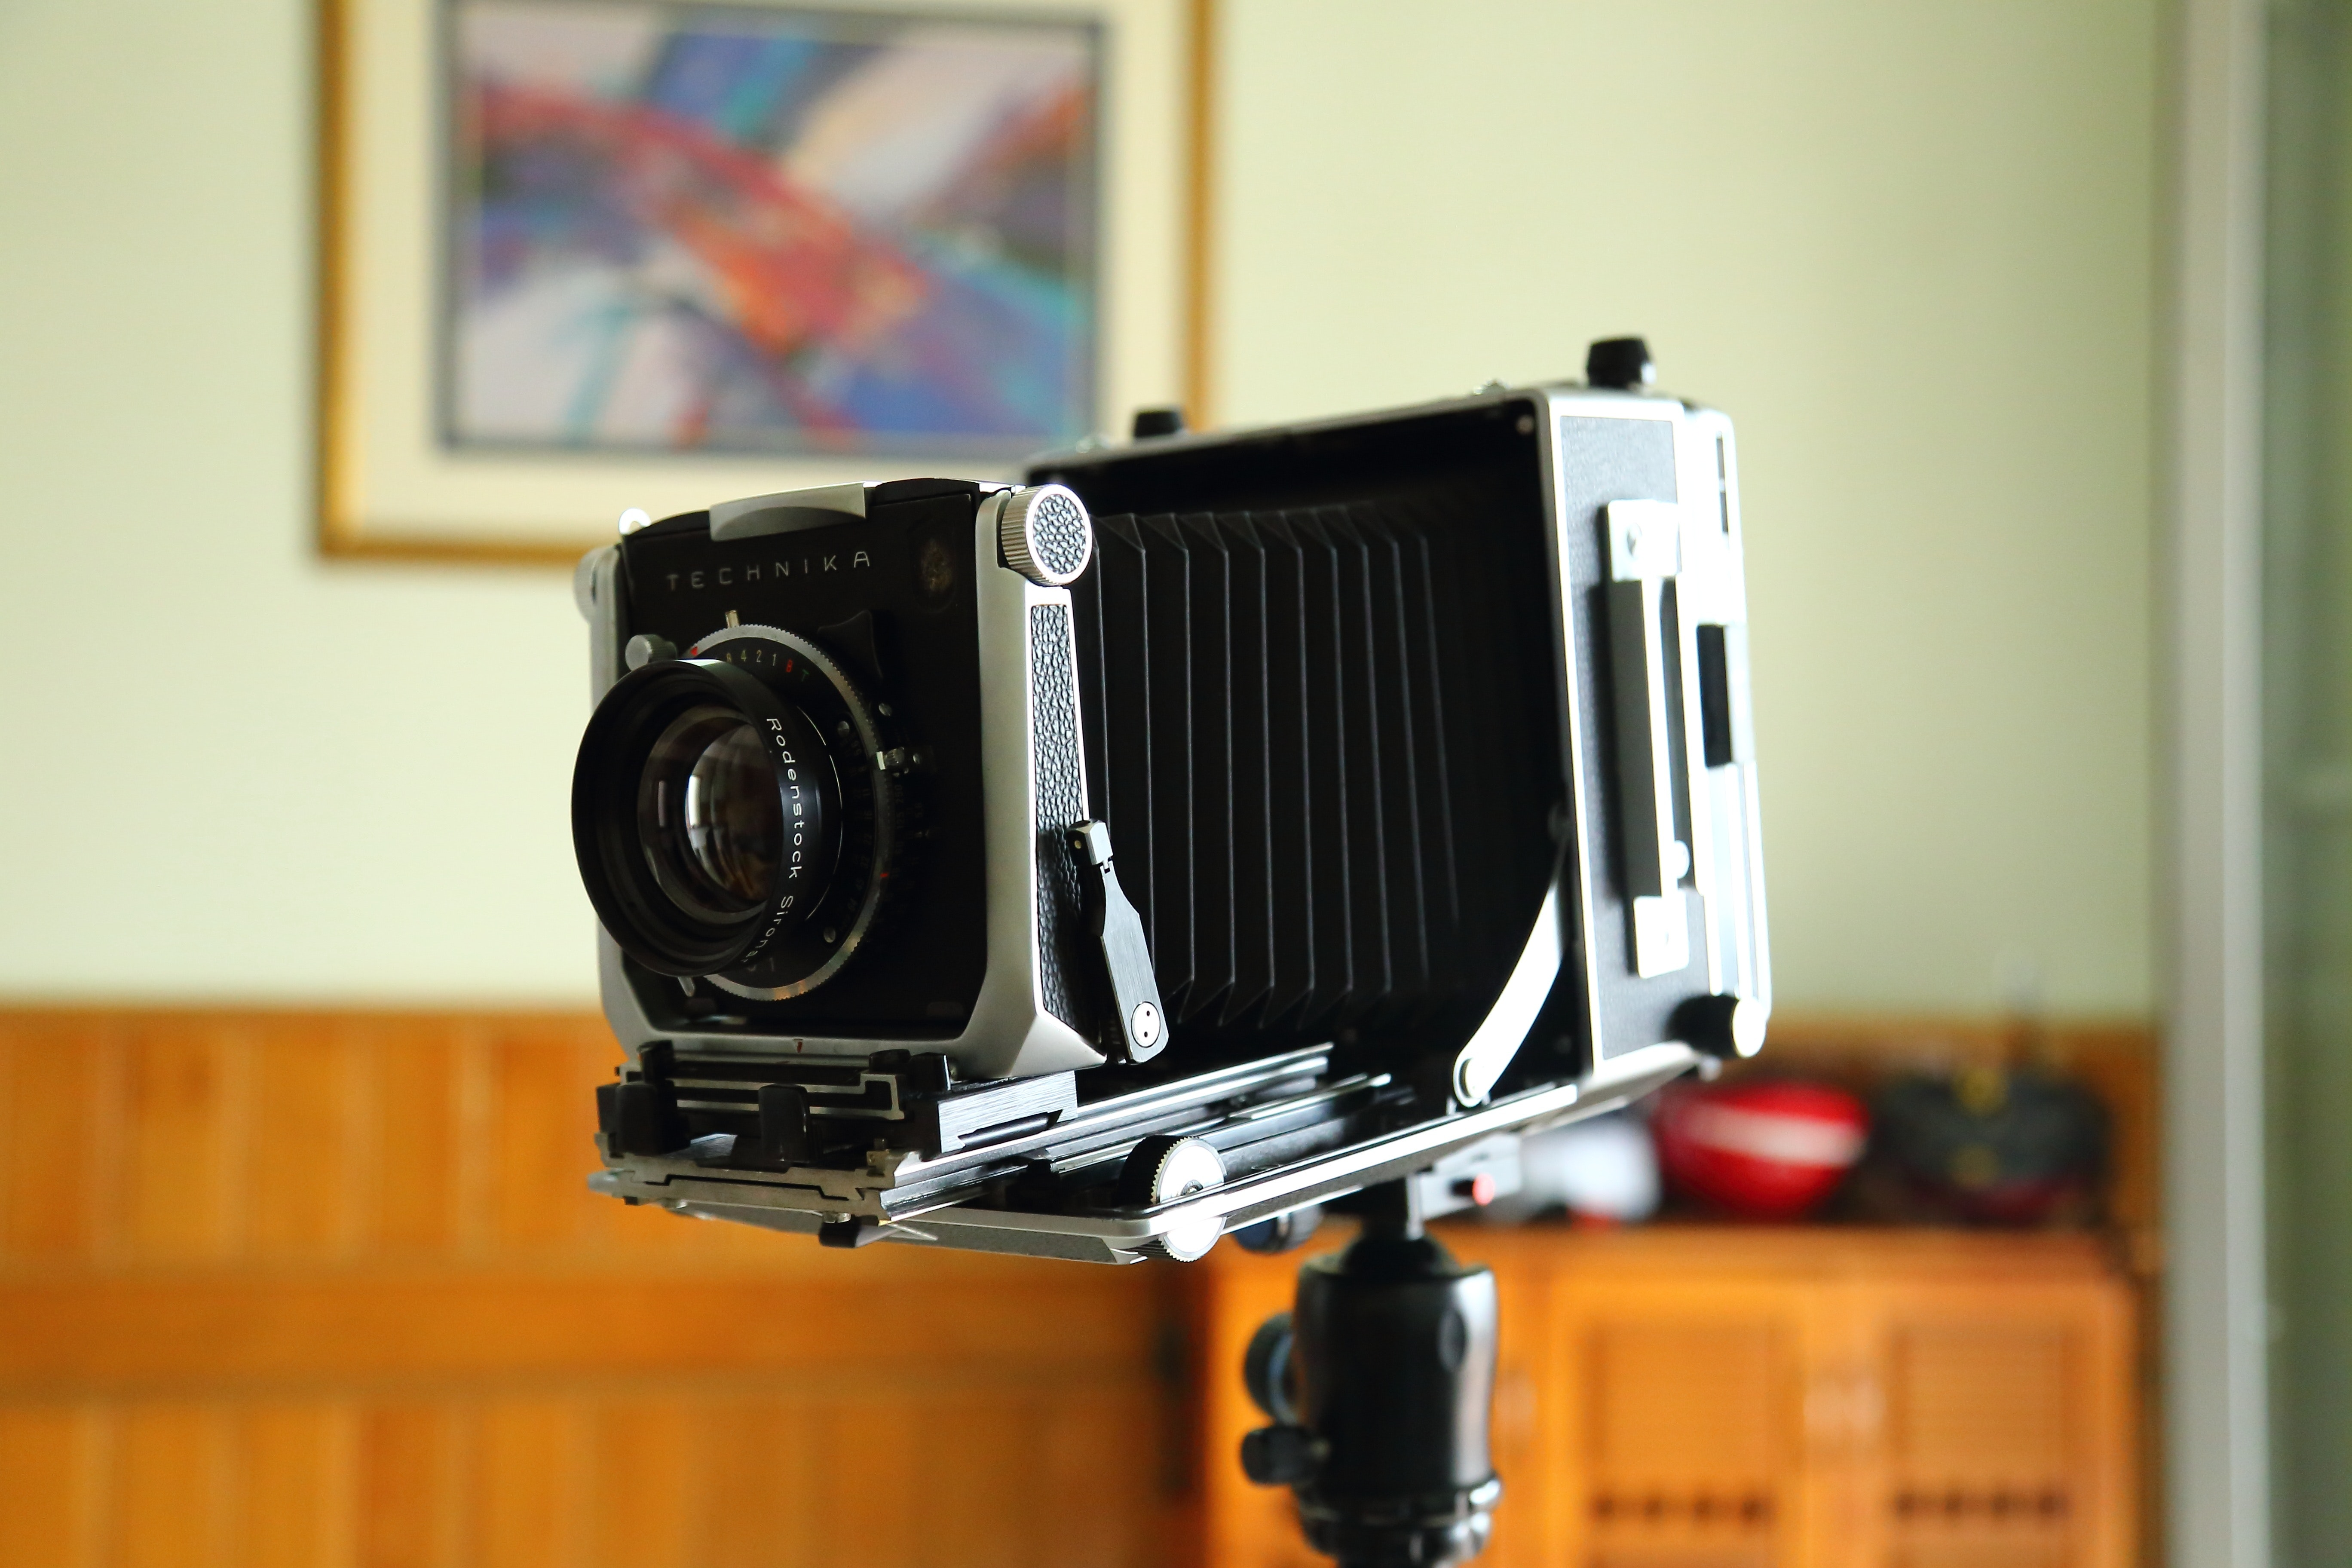 Close-up of Camera, Analogue, Optical, Vintage, Studio, HQ Photo